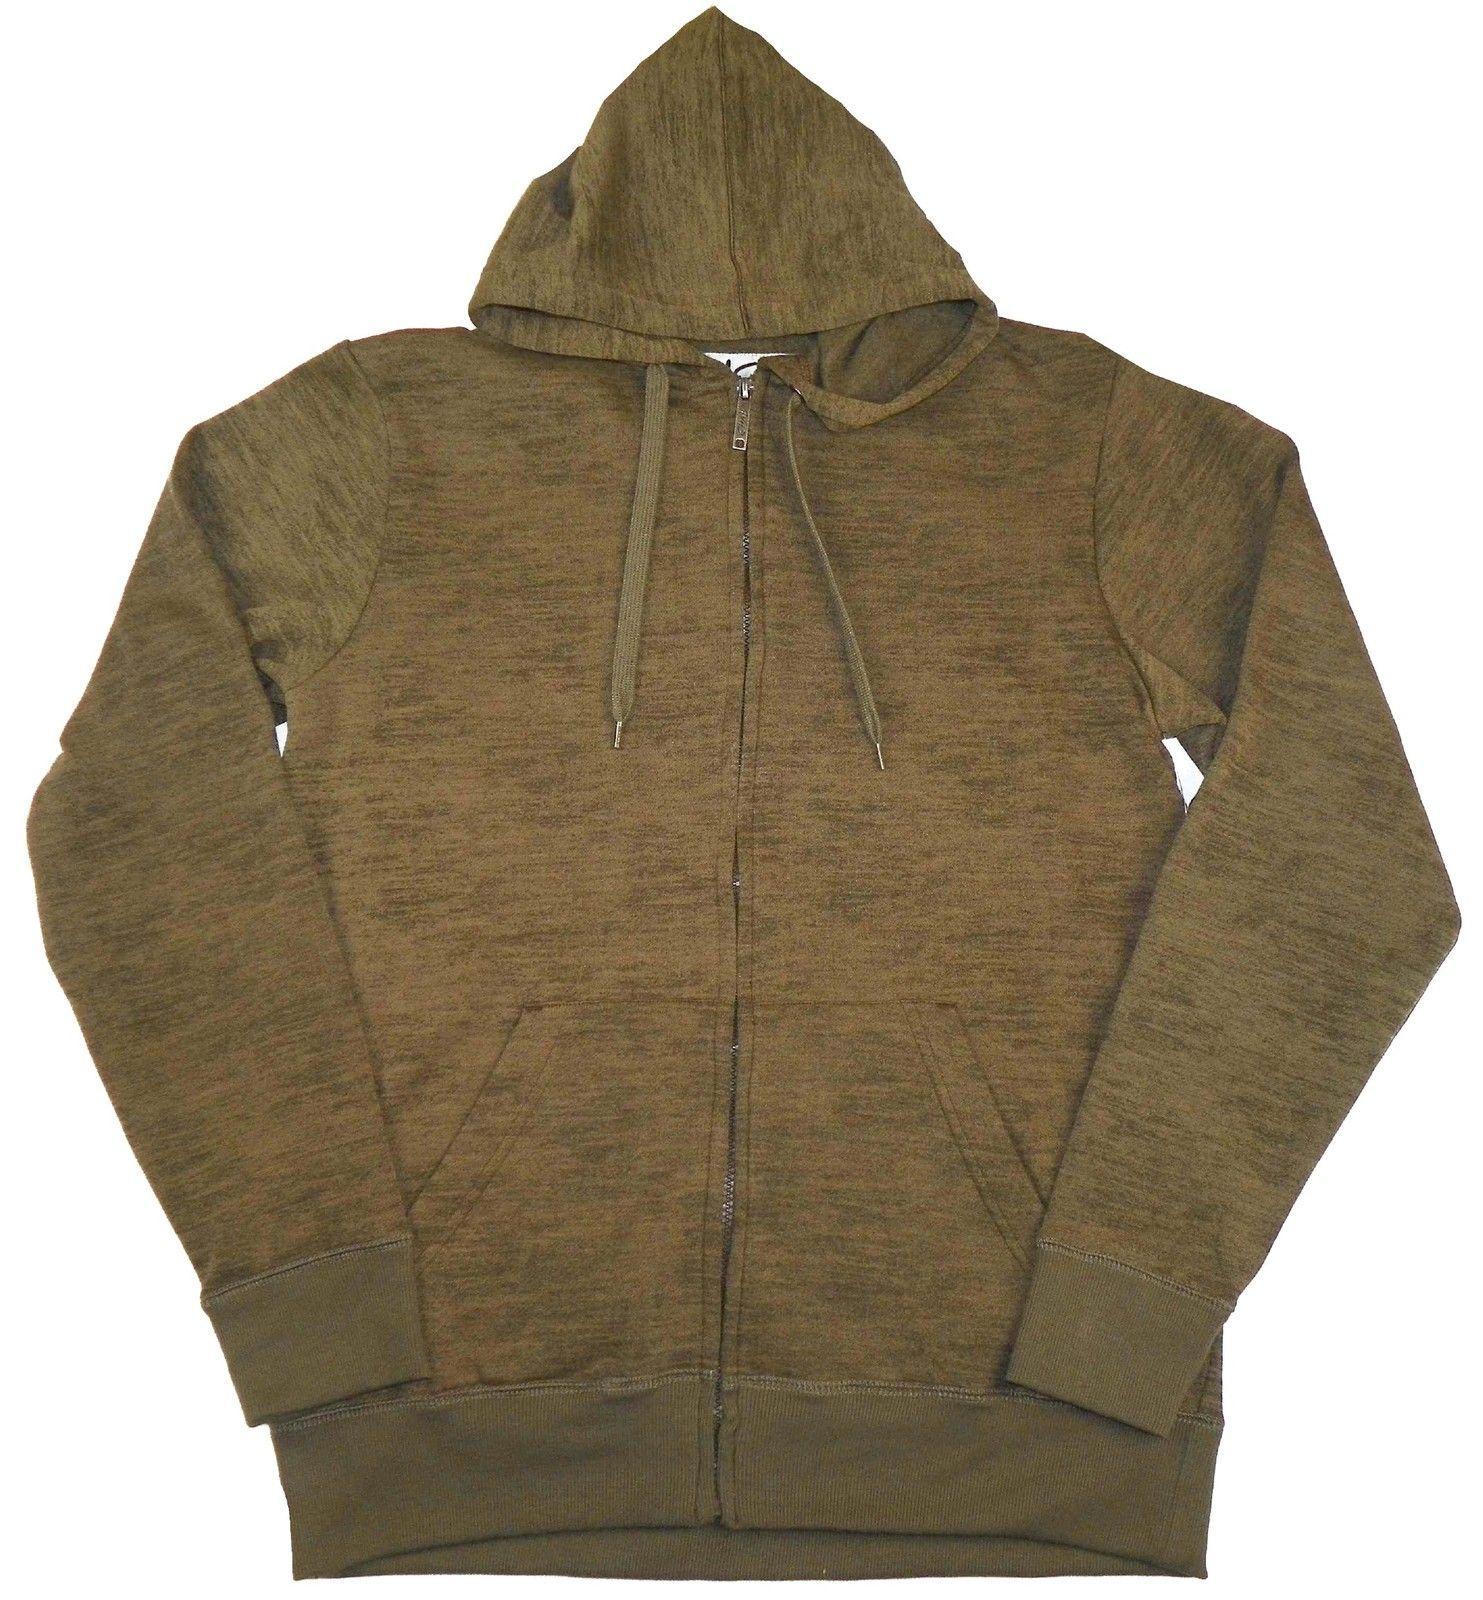 Men's Hoodie CHALC Brand Full Zip Hooded Sweatshirt Heathered Brown NEW